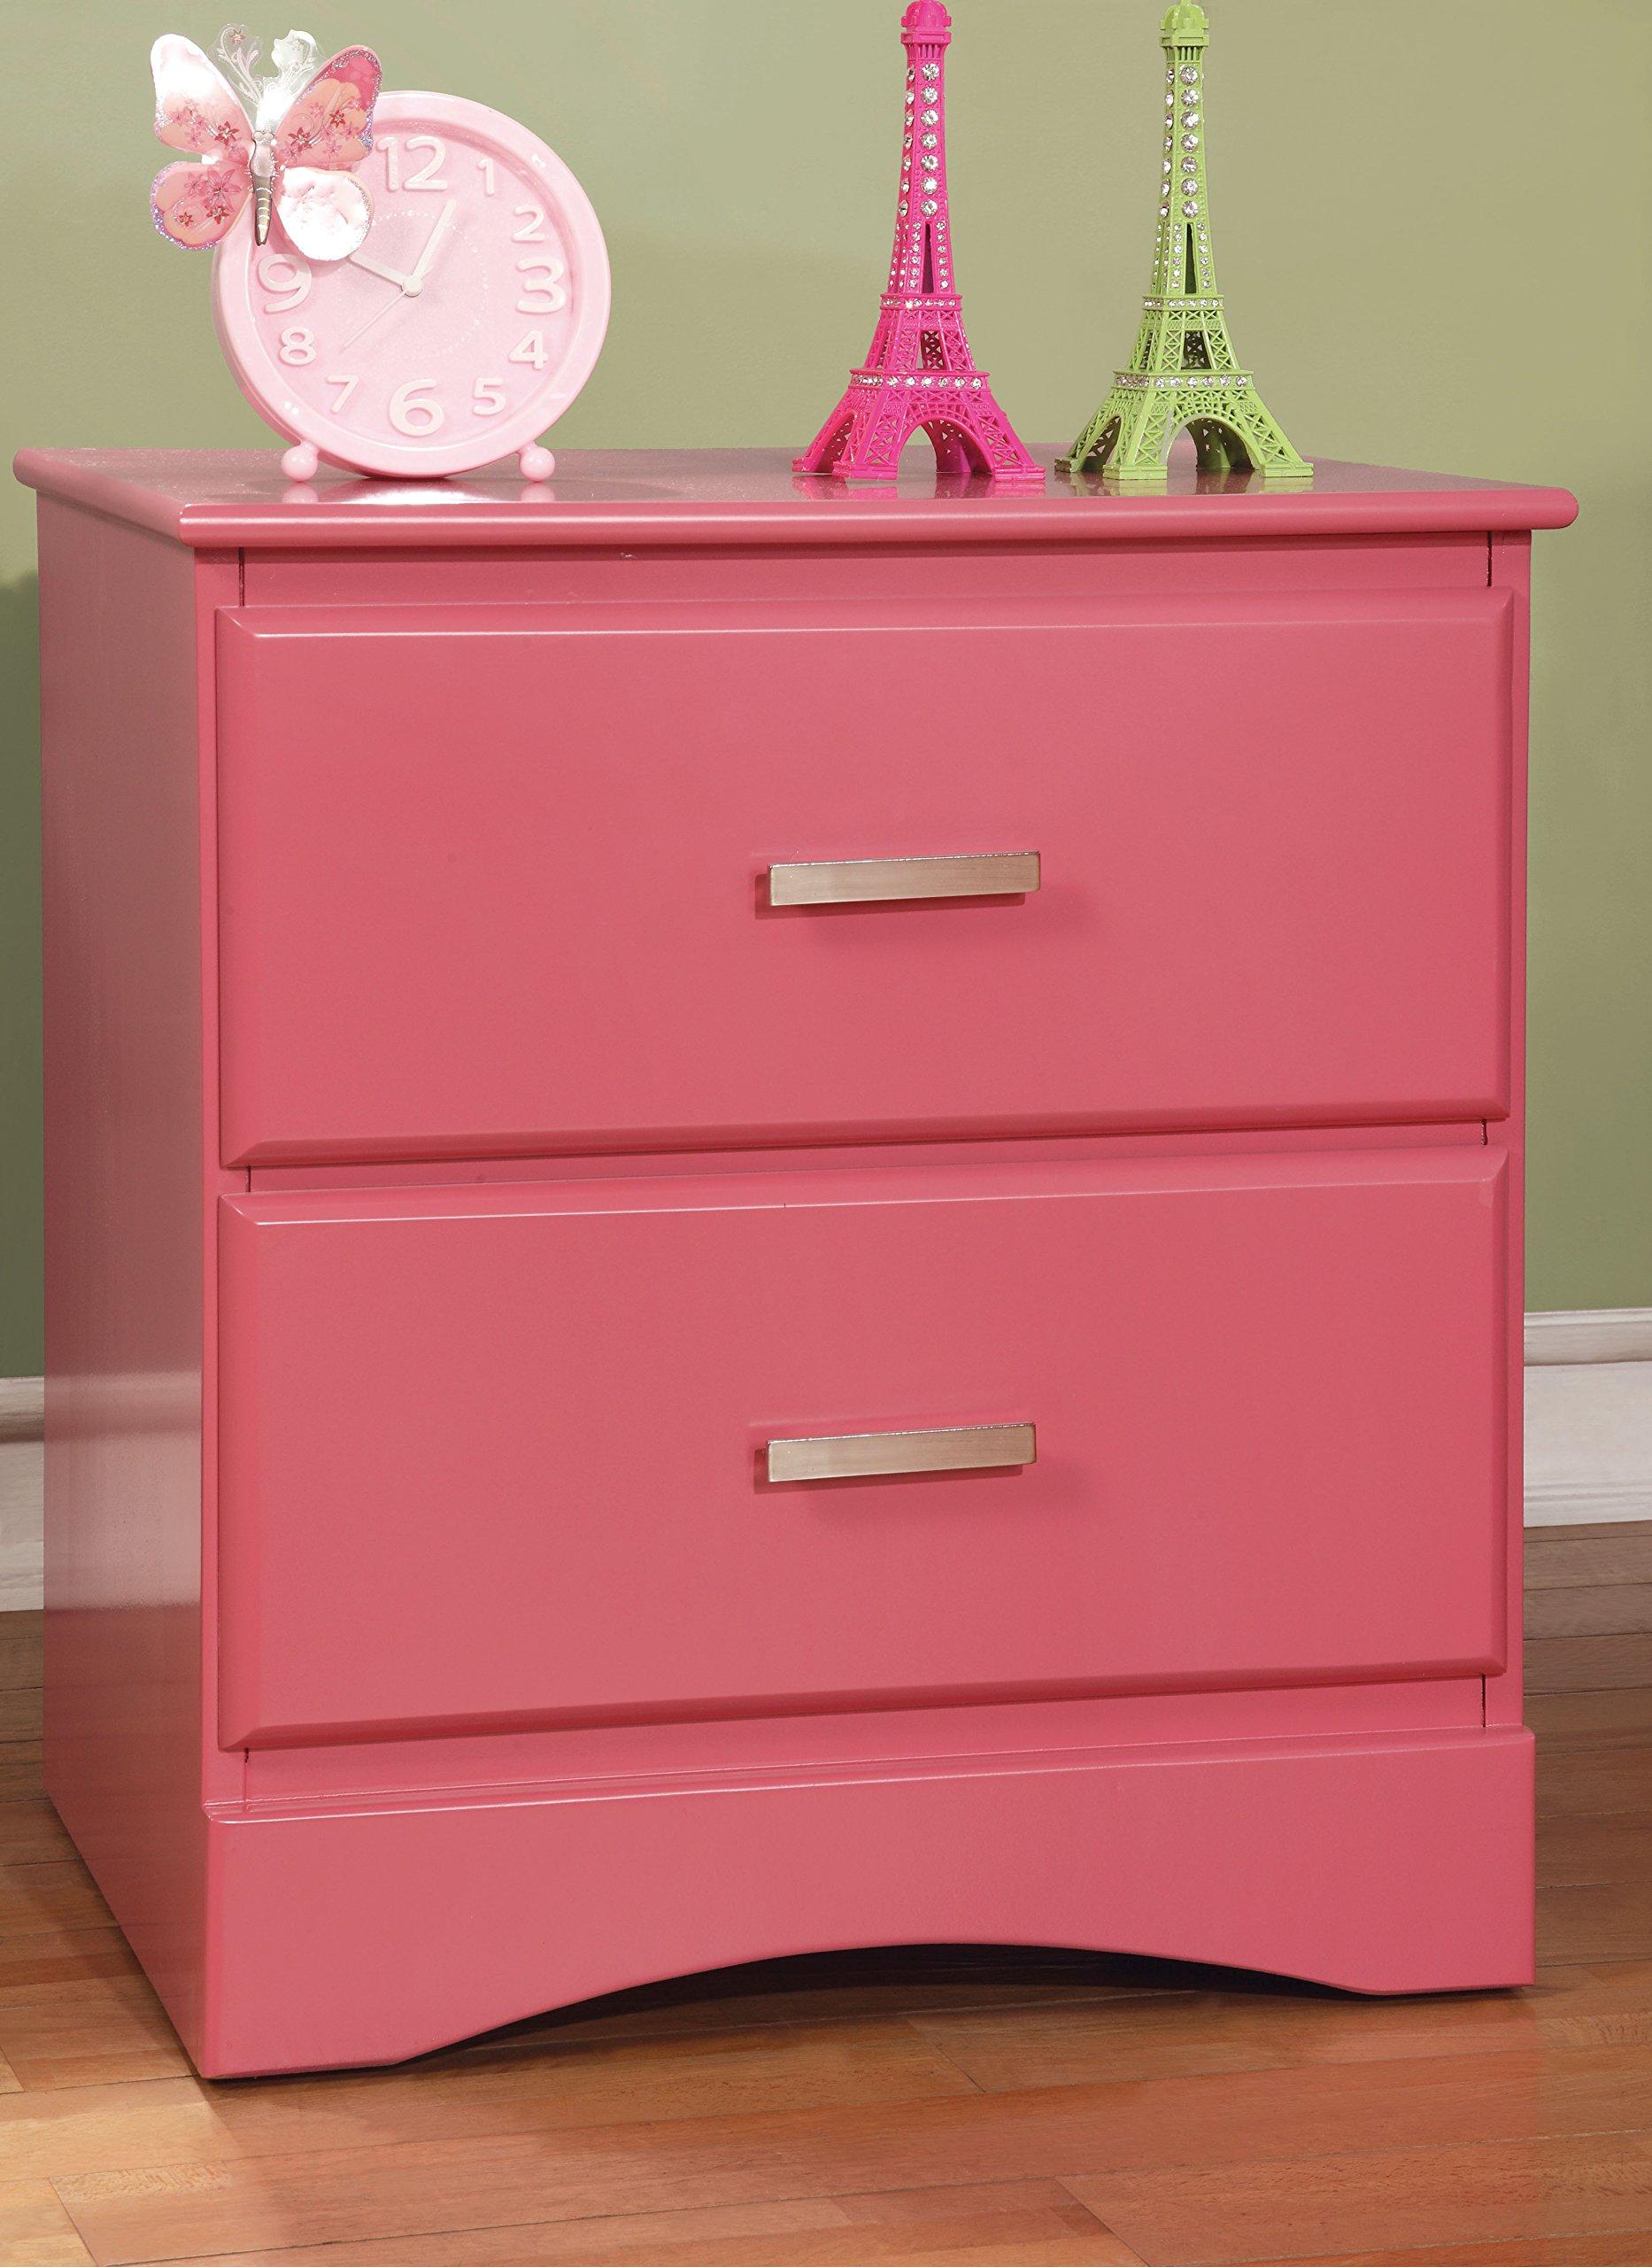 Furniture of America Kolora Youth Nightstand, Pink